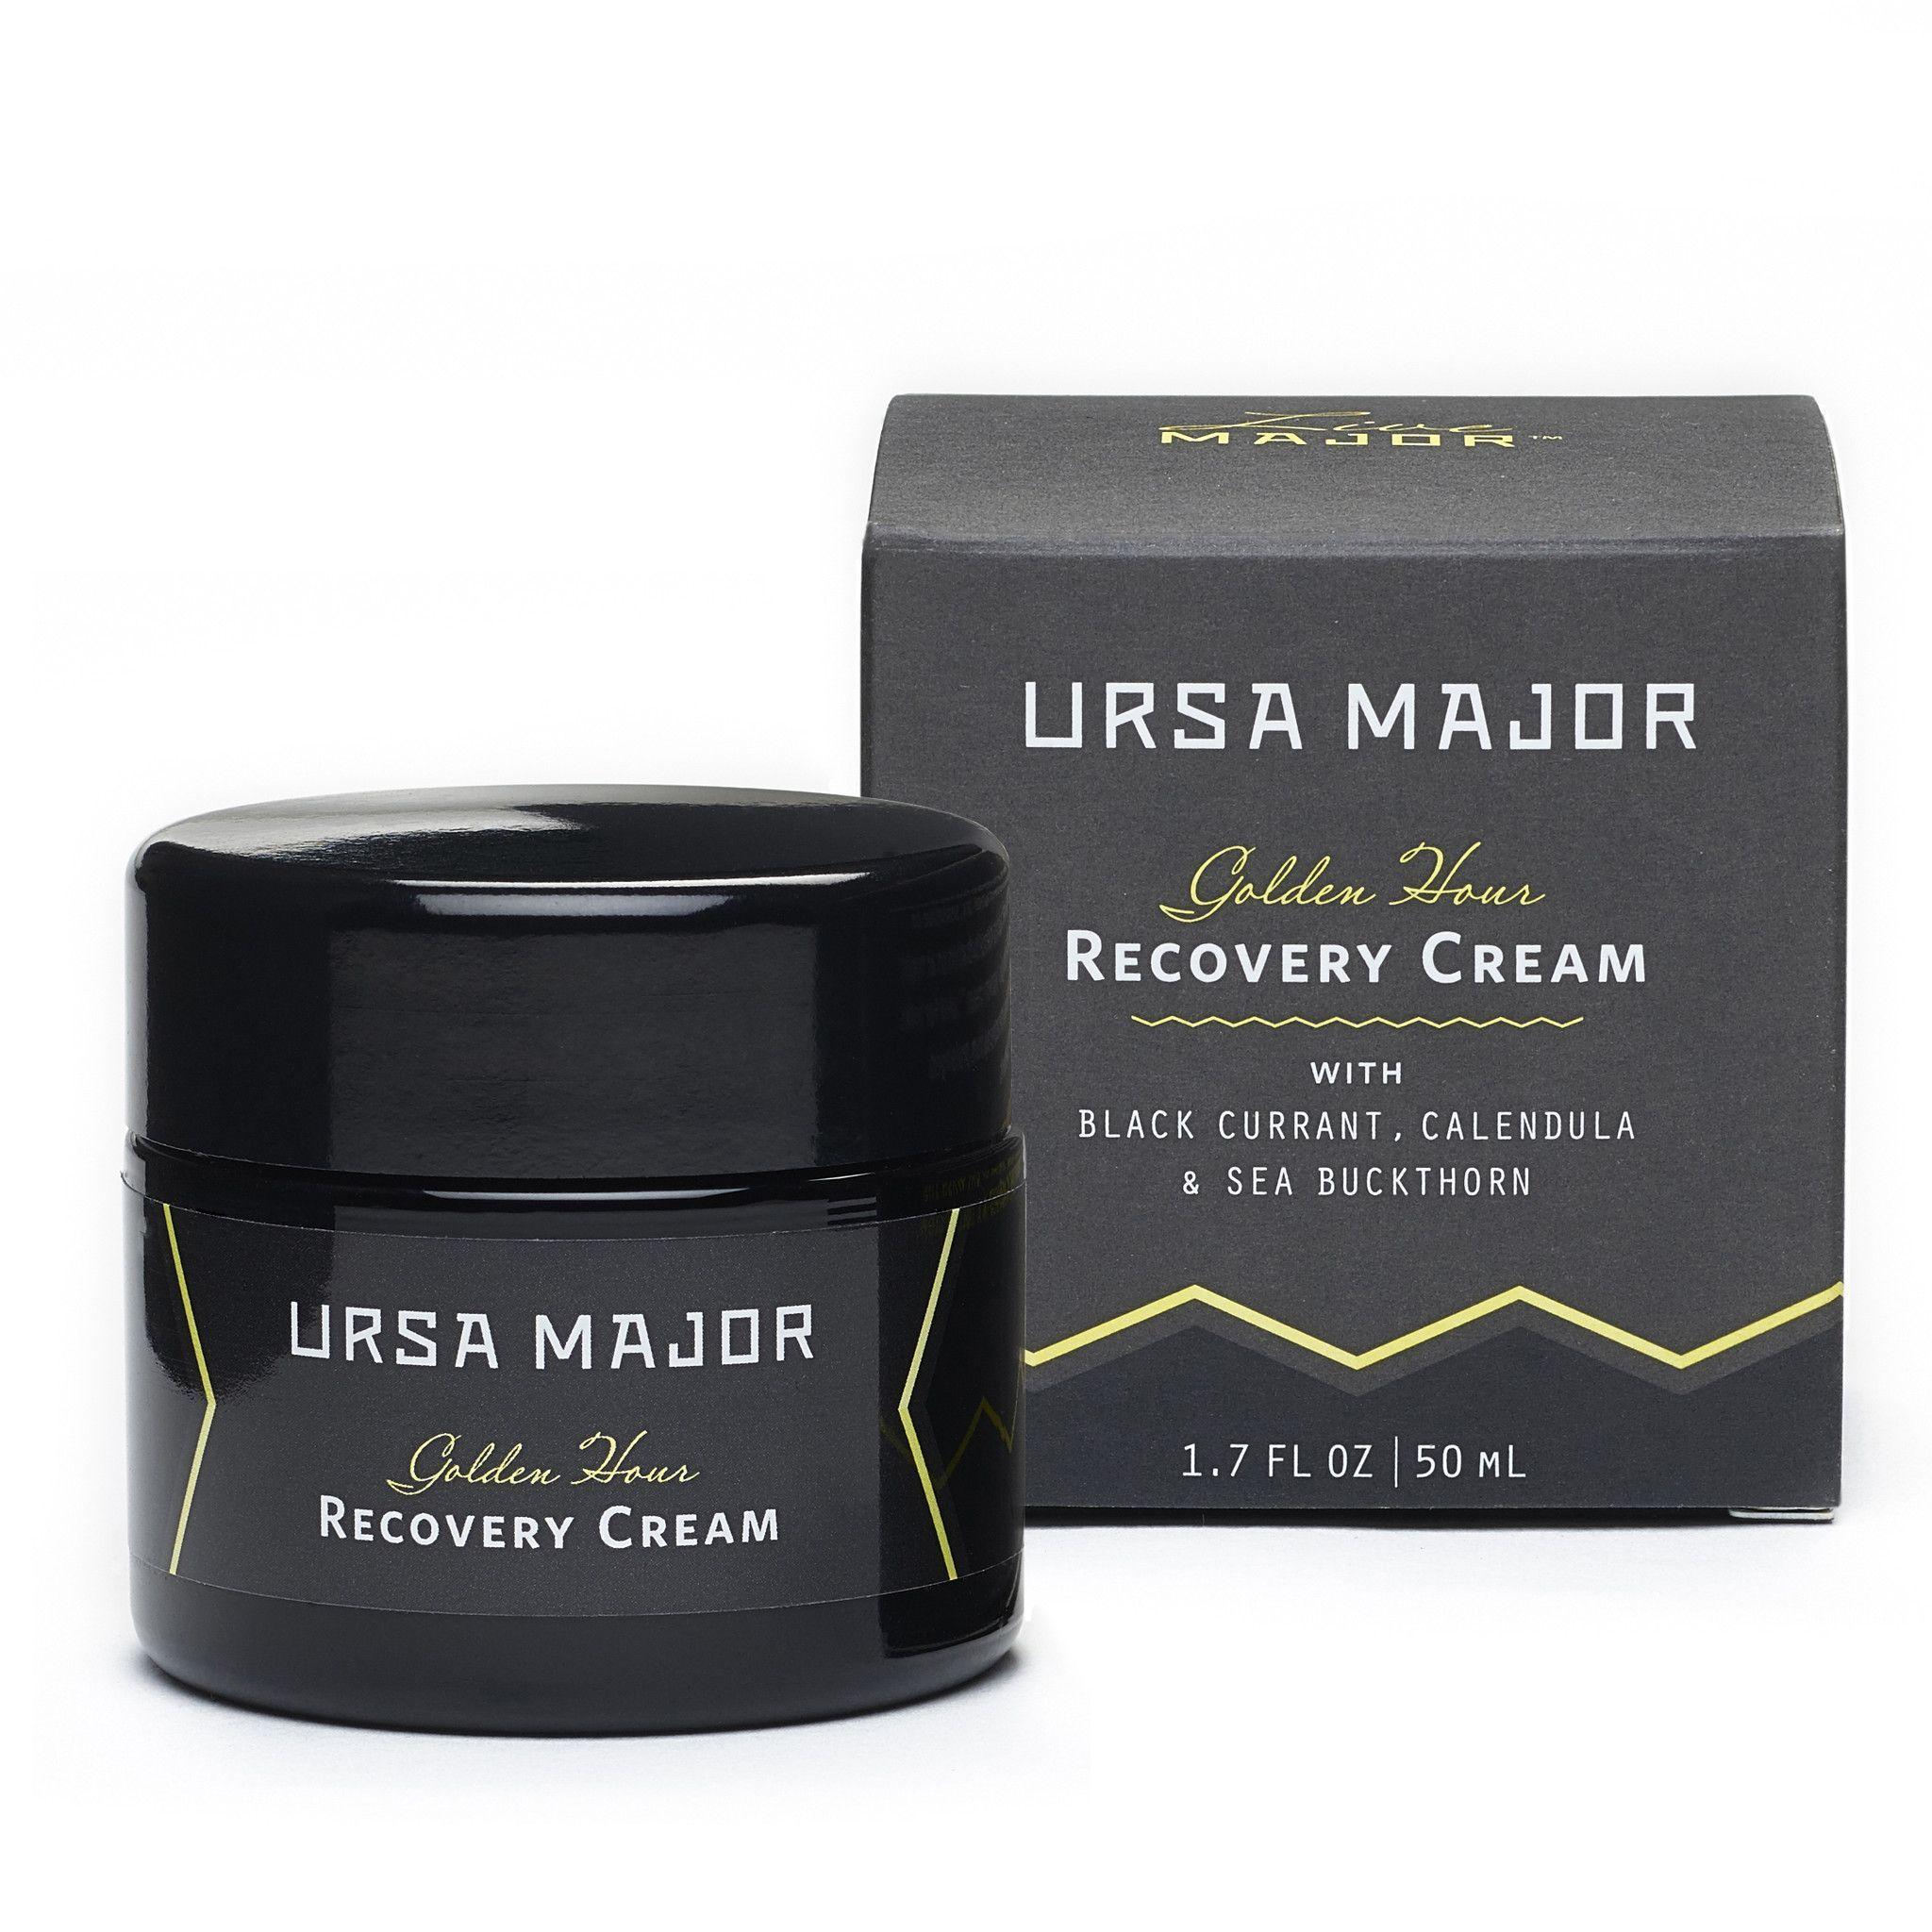 Golden hour recovery cream best anti aging creams cream